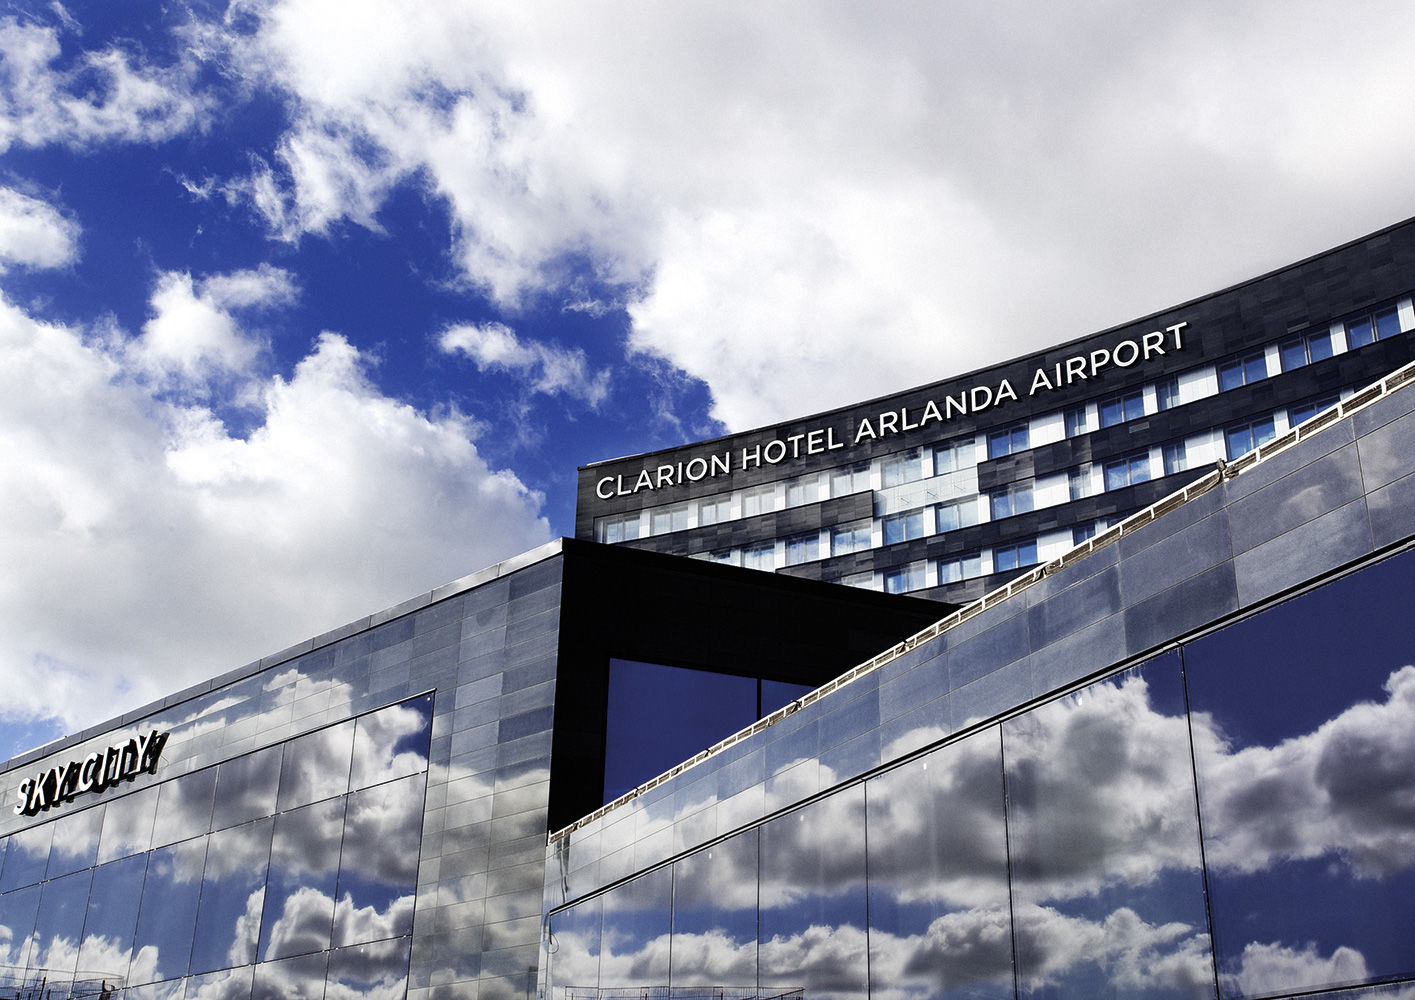 Clarion hotel arlanda airport stockholm realizations en for Hotel near arlanda airport stockholm